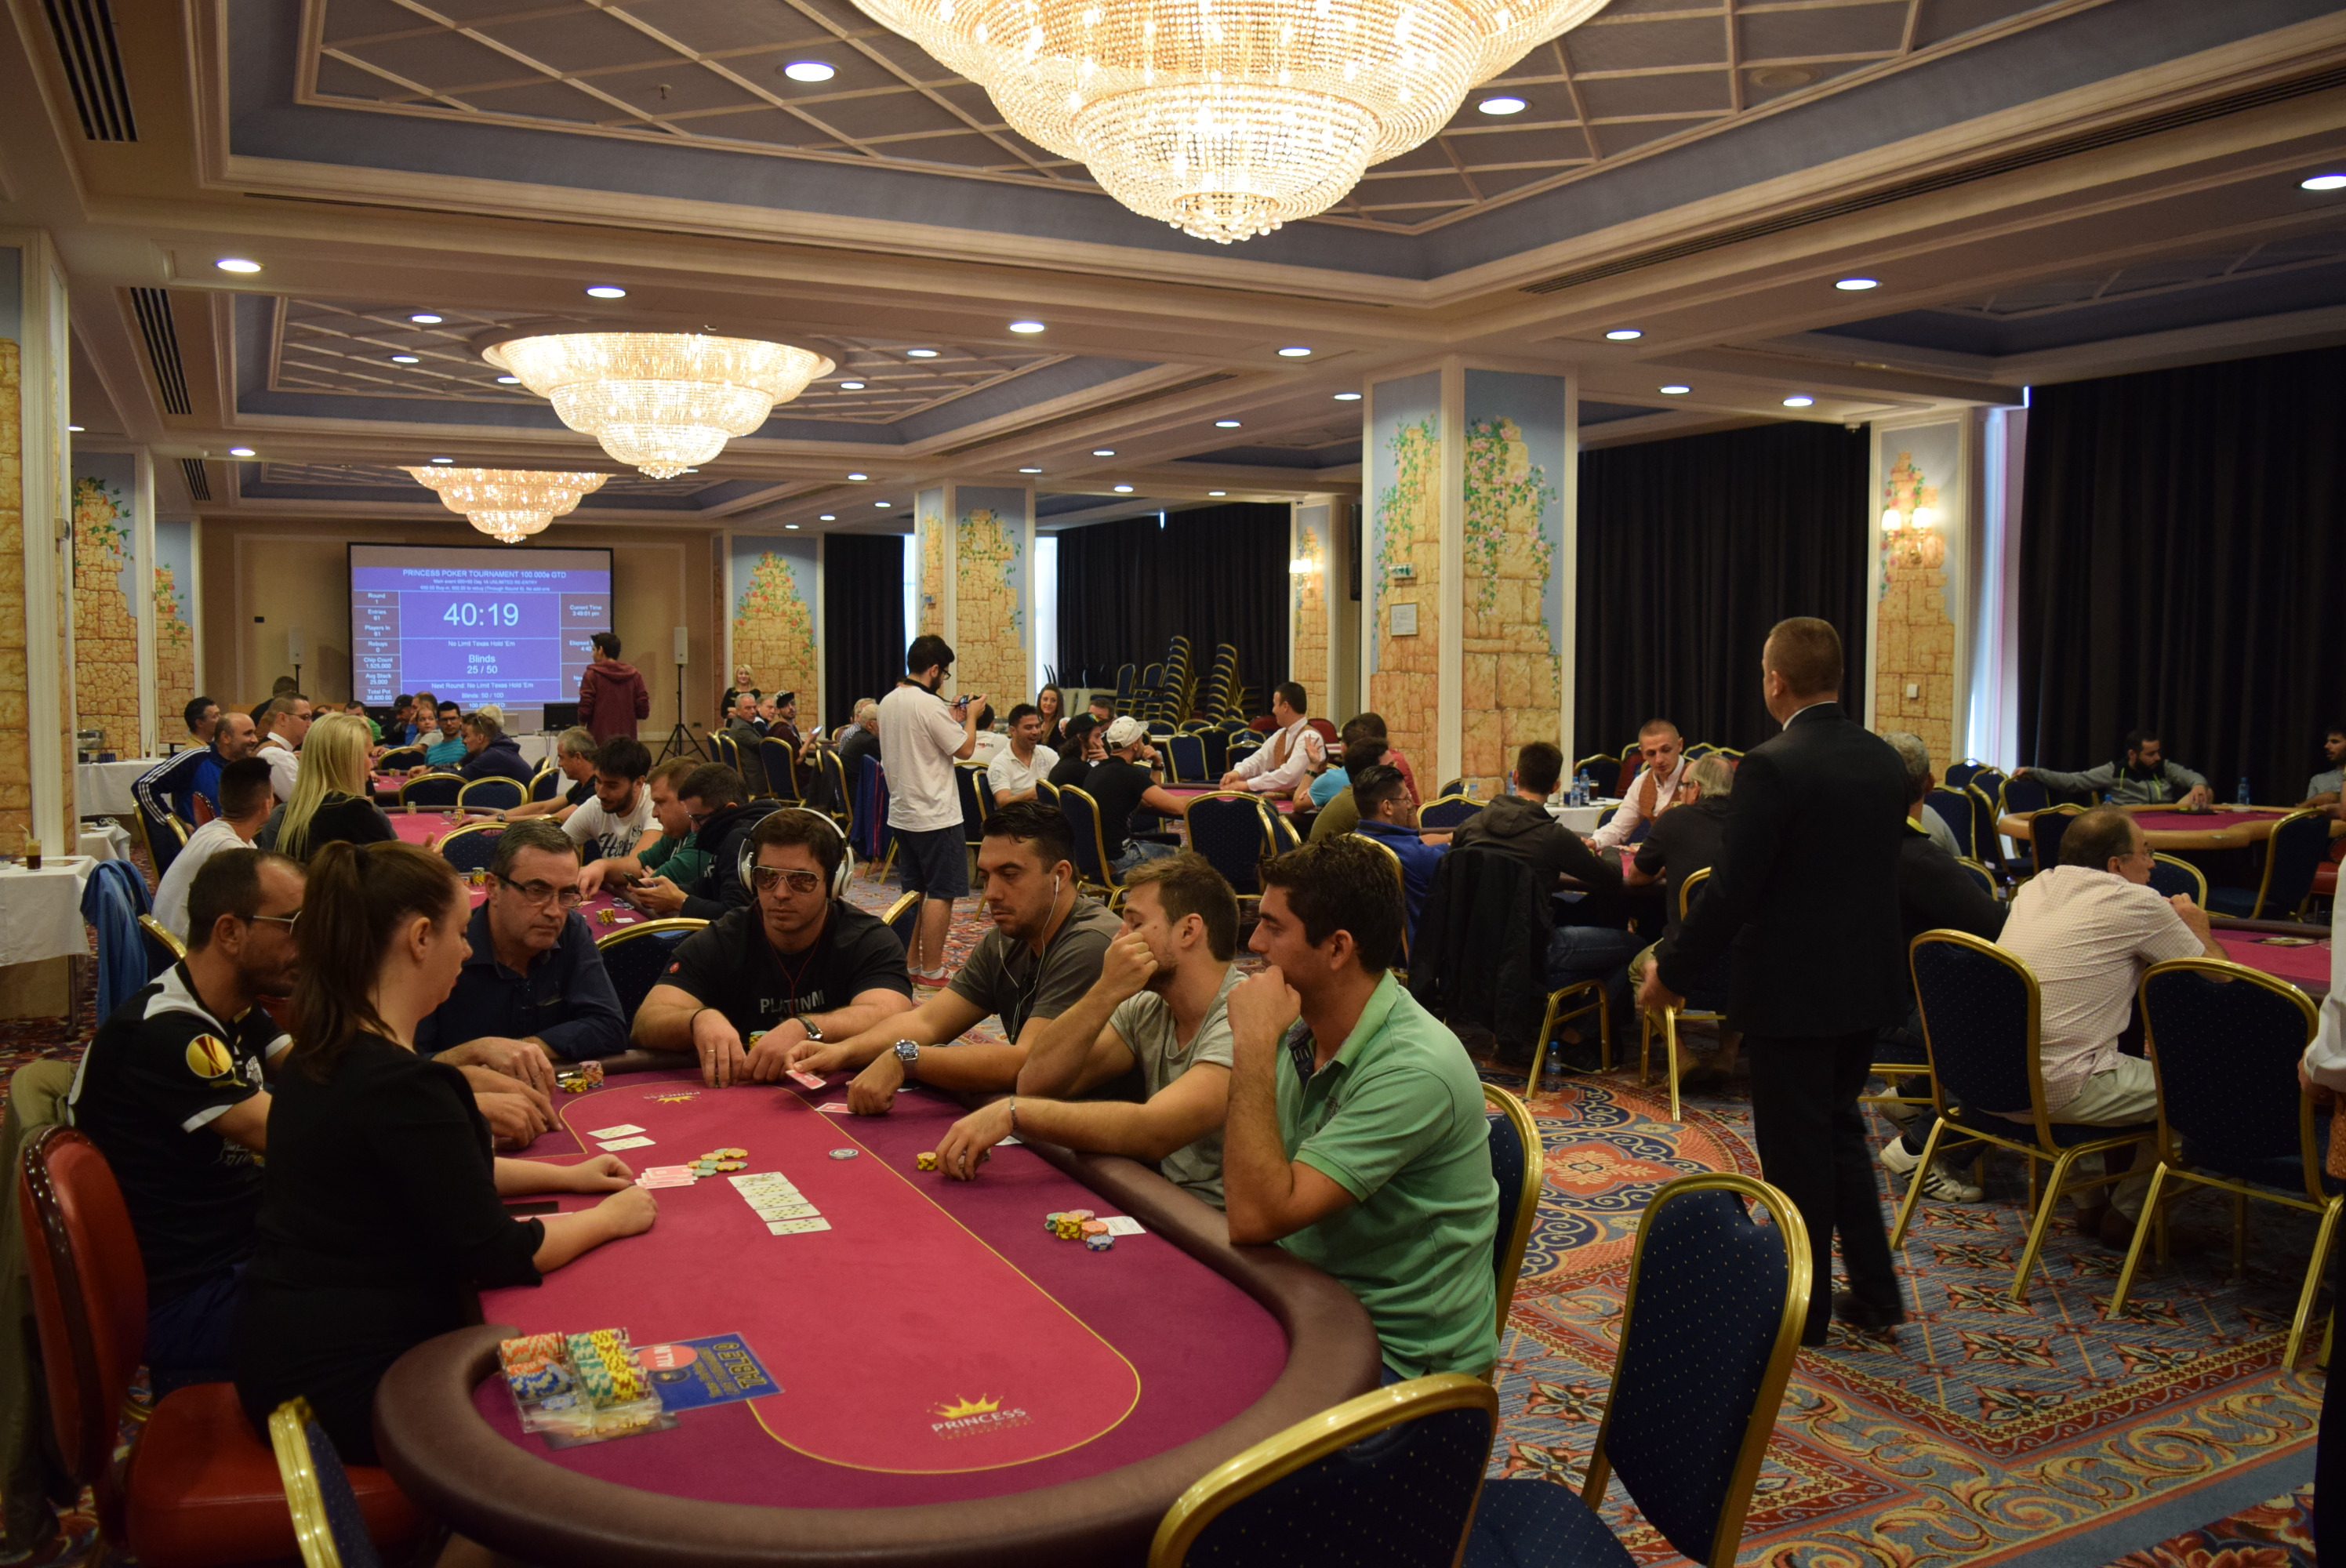 Pokerland / Slots gods of olympus